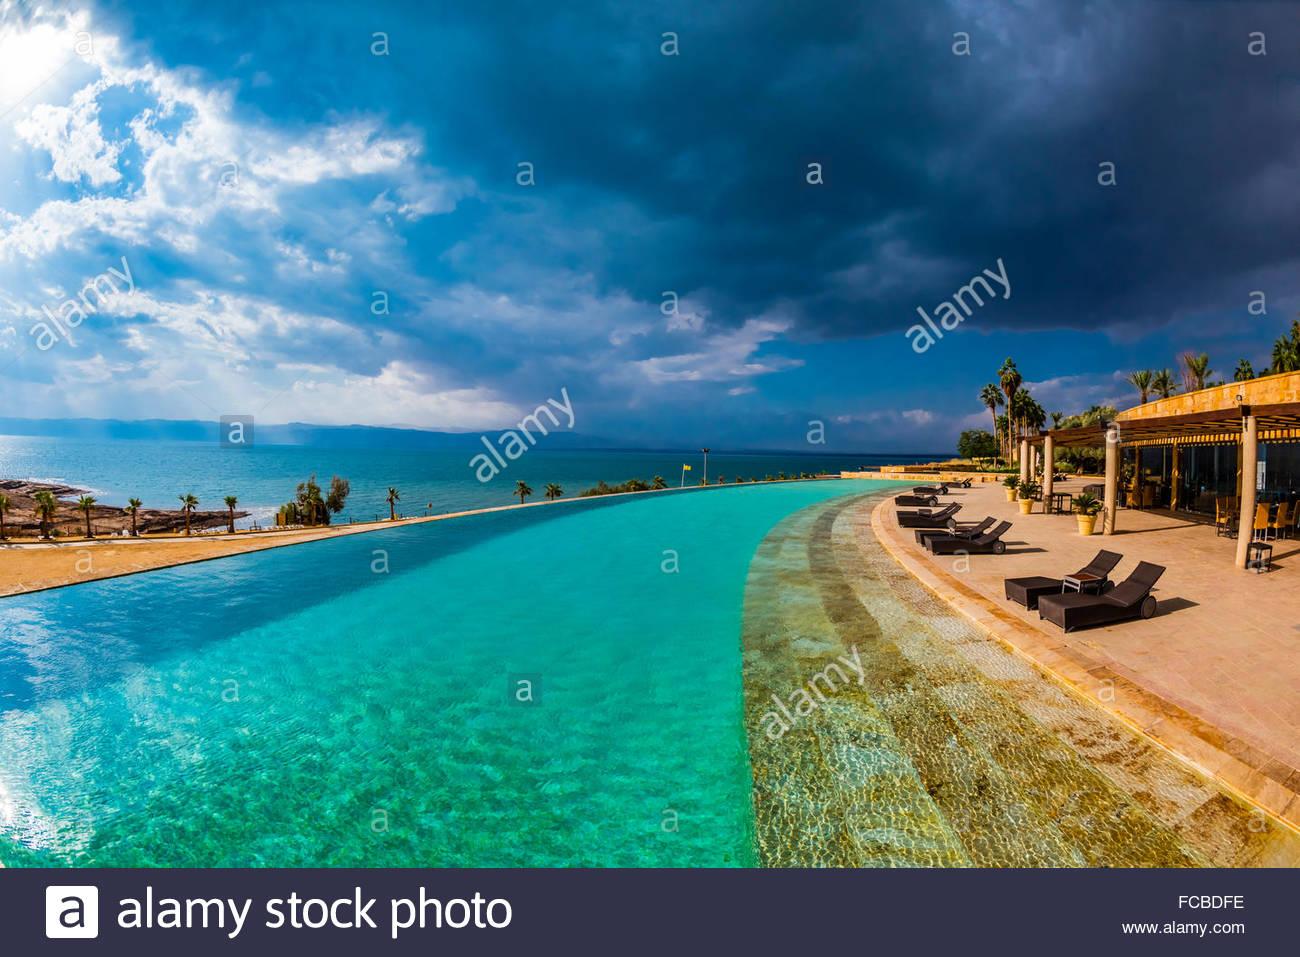 sea point swimming pool stockfotos sea point swimming. Black Bedroom Furniture Sets. Home Design Ideas